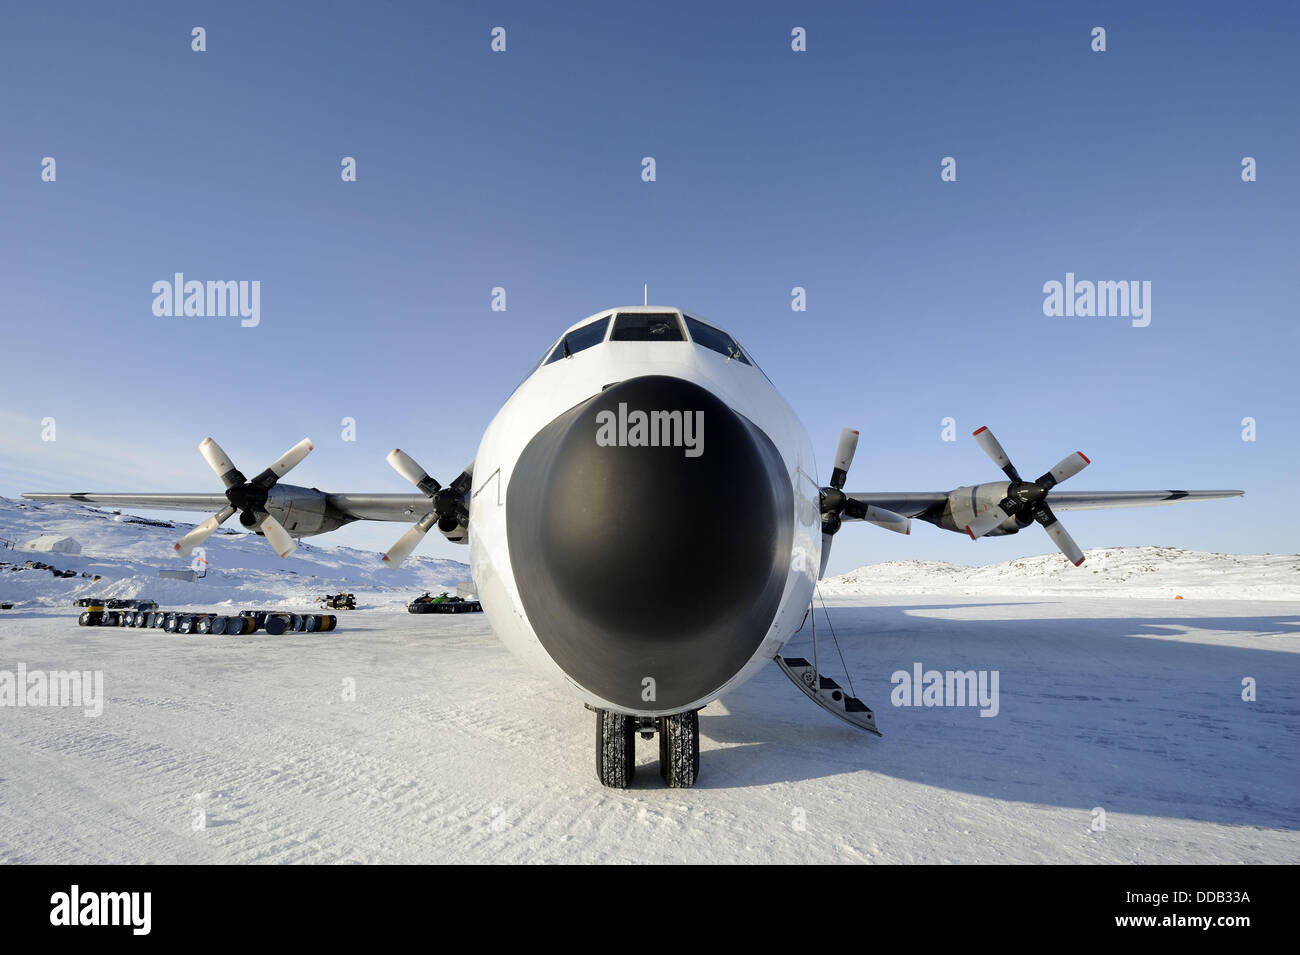 Hercules cargo aircraft transporting mining equipment, Yellowknife, Northwest Territories, Canada - Stock Image